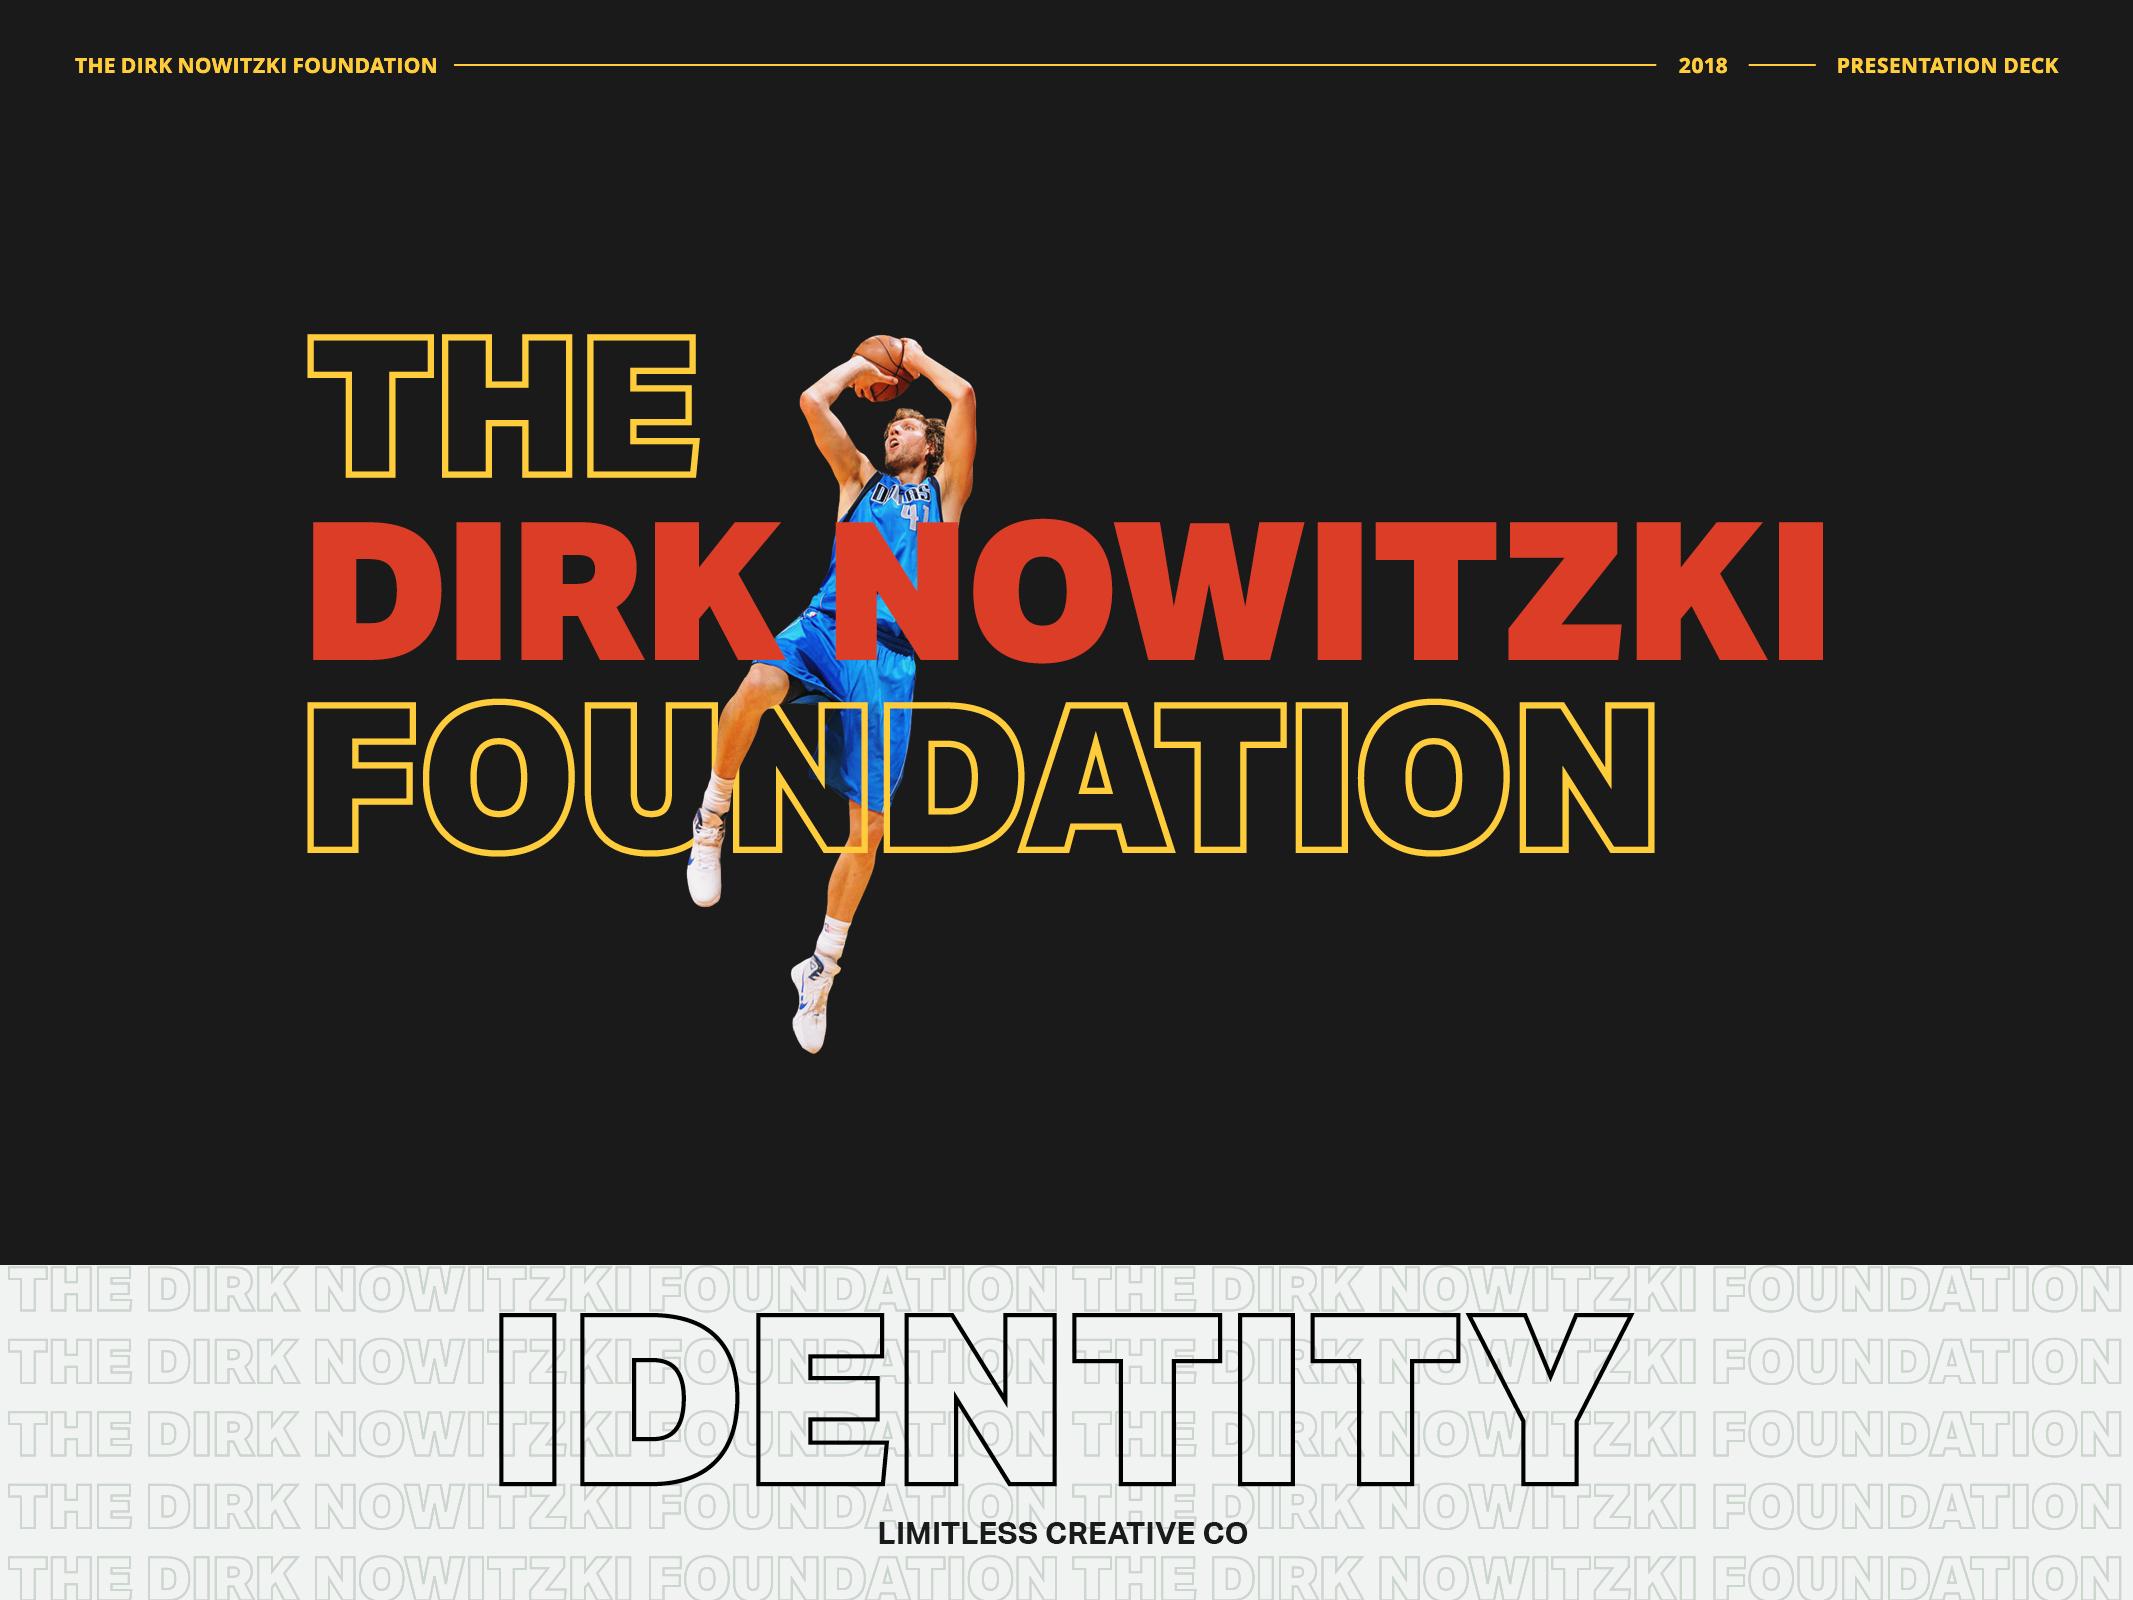 Dirk Foundation Deck15.jpg